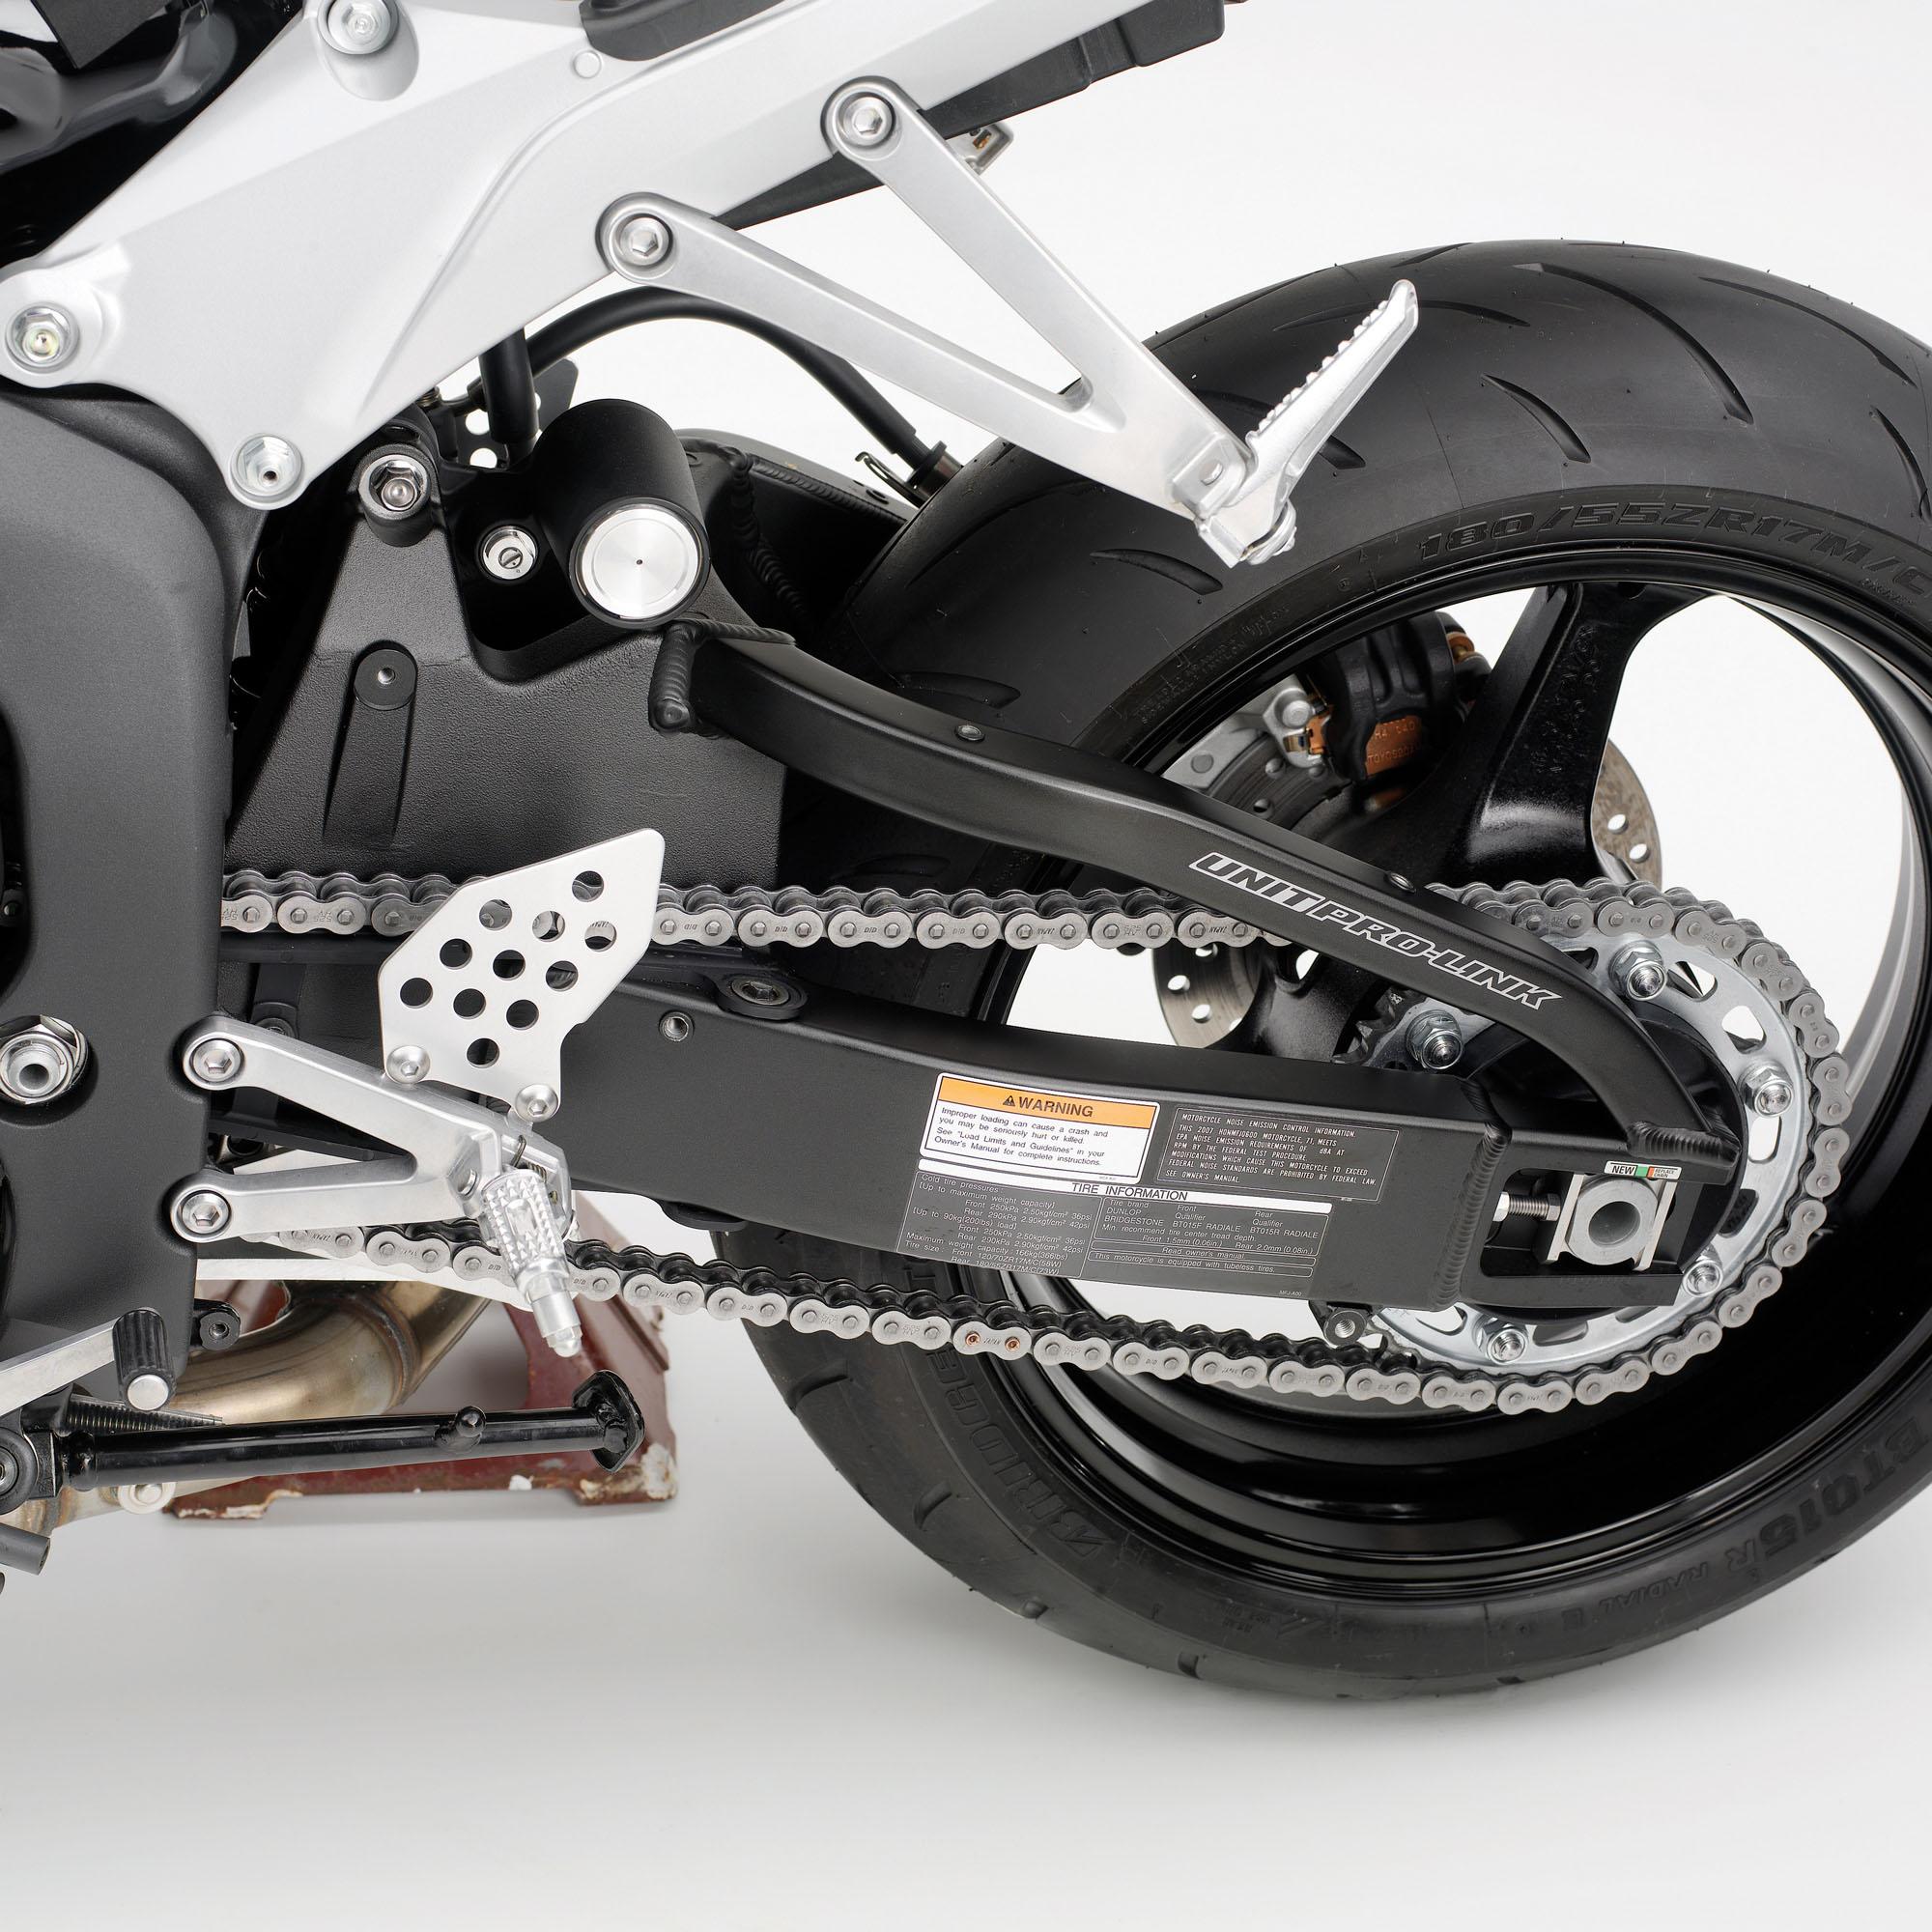 2017 Honda Cbr600rr Review Specs 600cc Cbr Supersport Bike 2005 600 Rr Color Wiring Diagram Technical Specifications